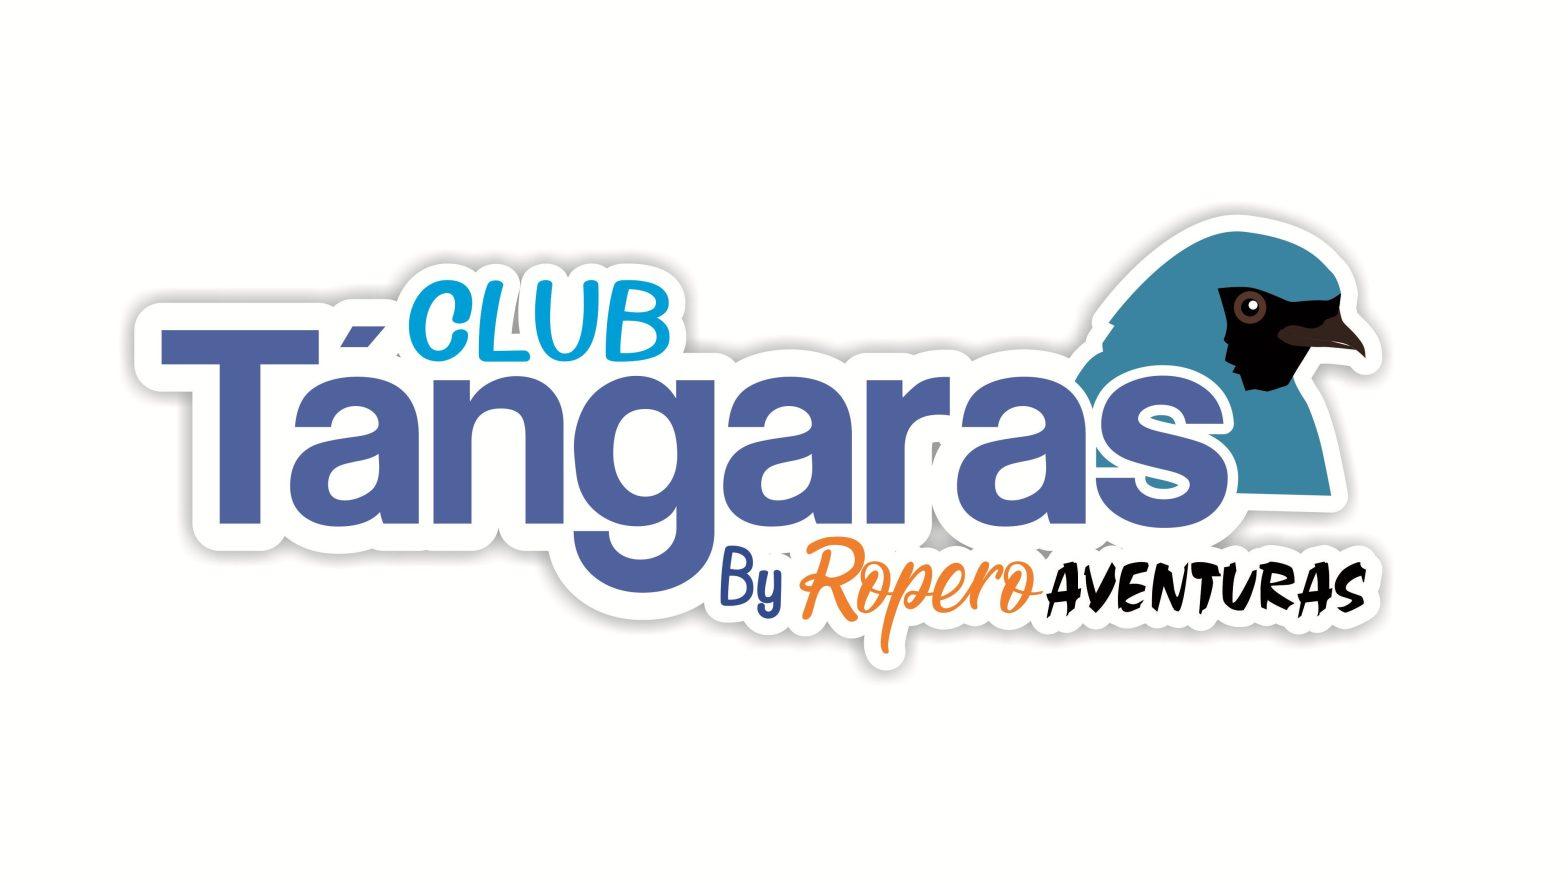 logo de una marca registrada